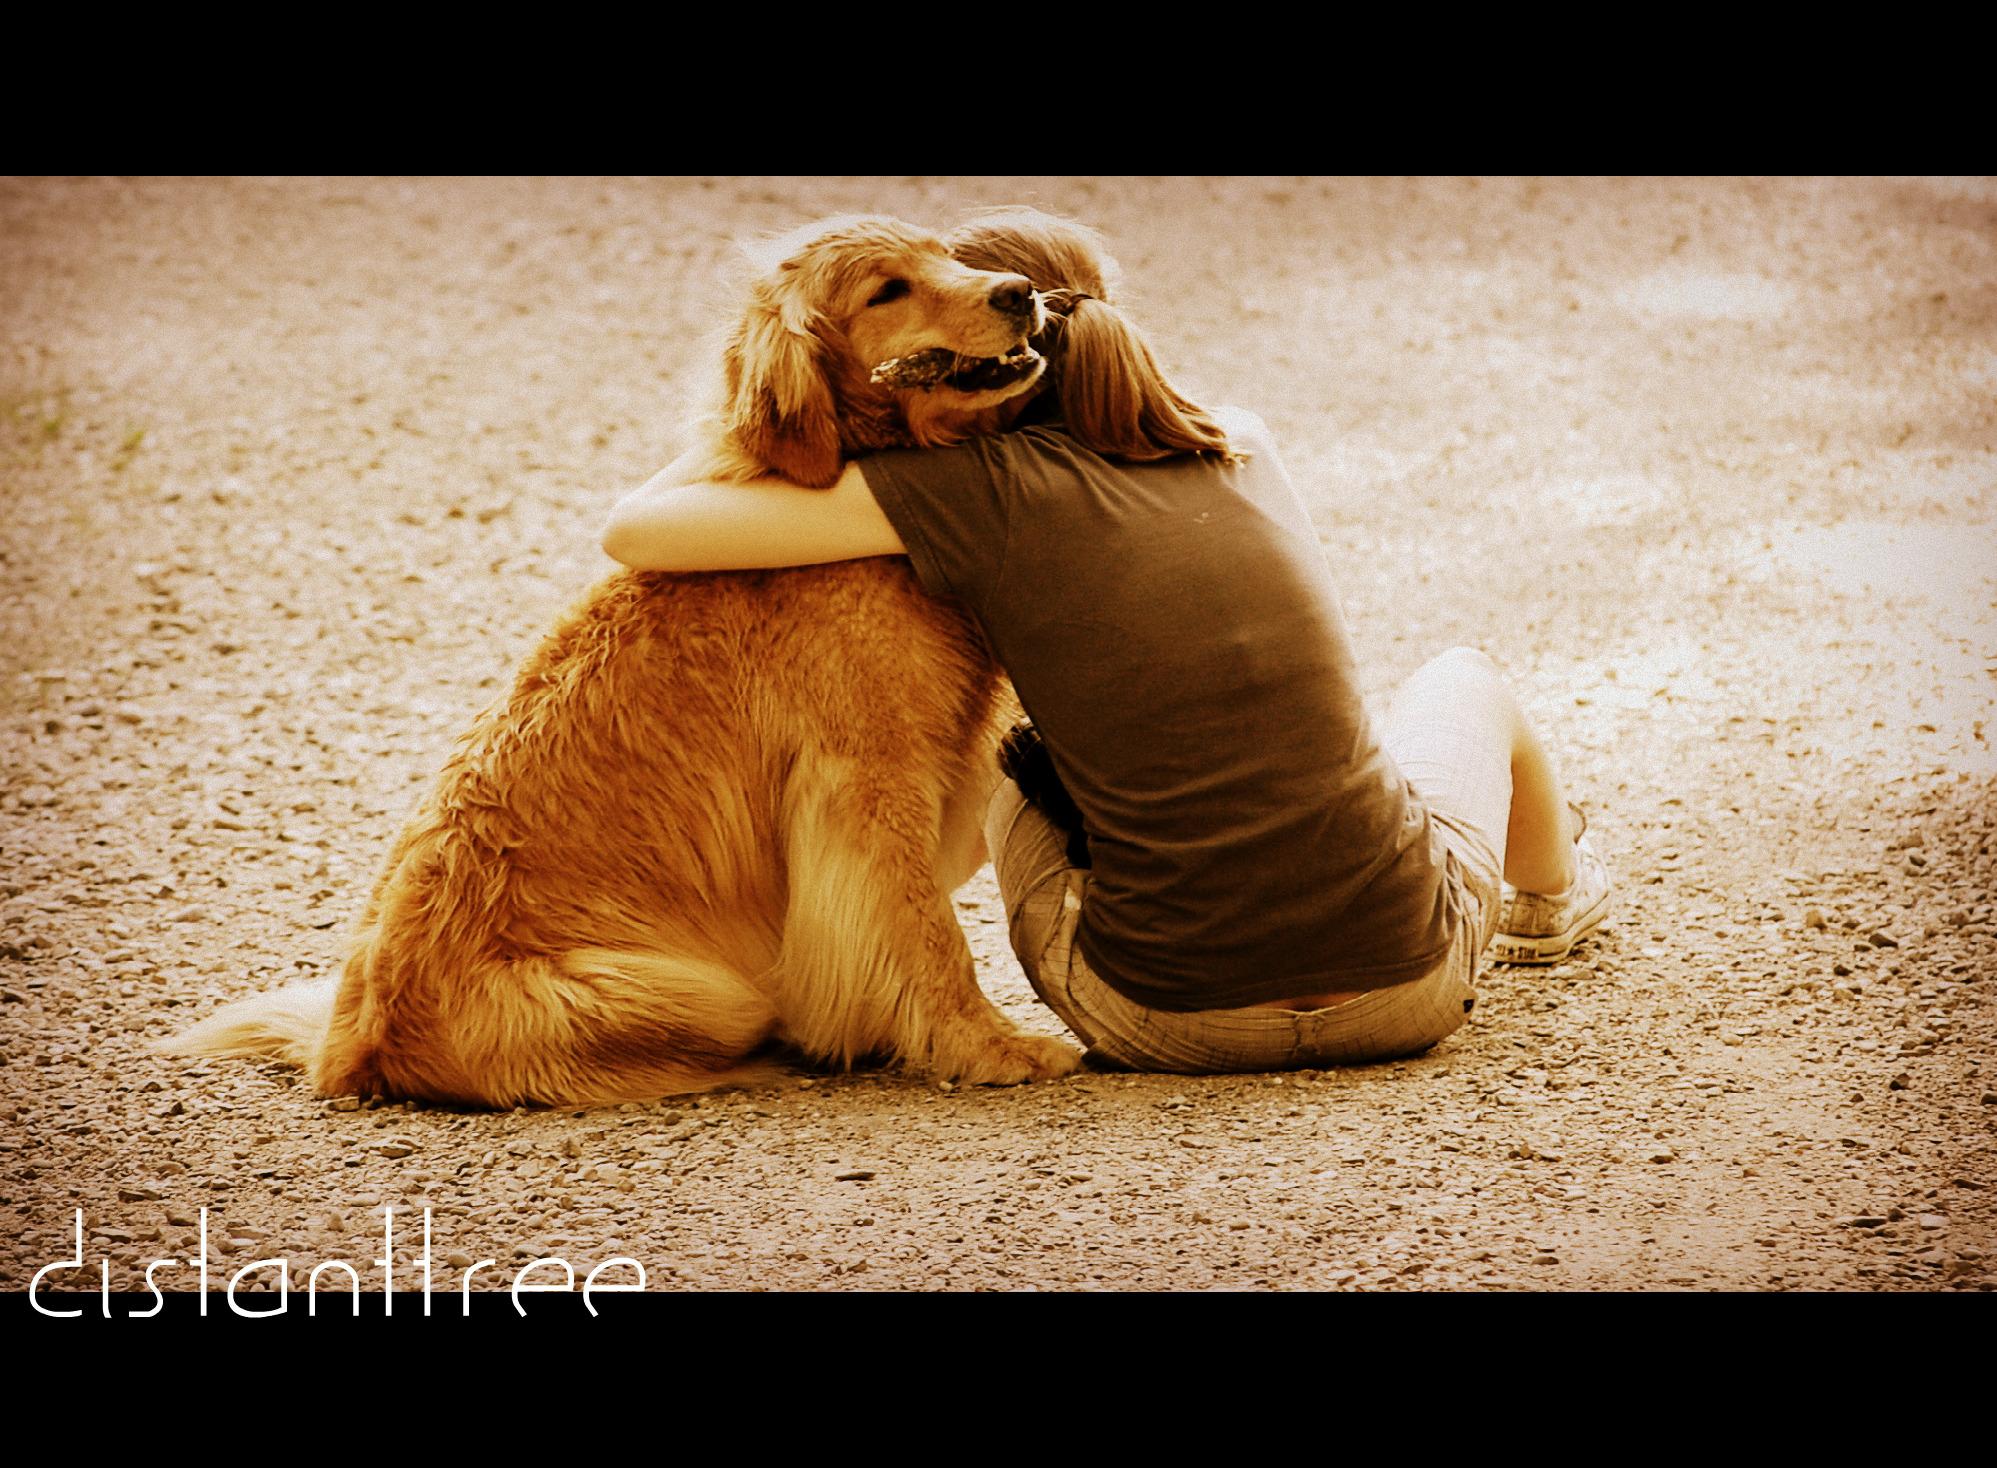 Volim te kao prijatelja, psst slika govori više od hiljadu reči - Page 2 Best_Friends_Forever_by_DistantTree